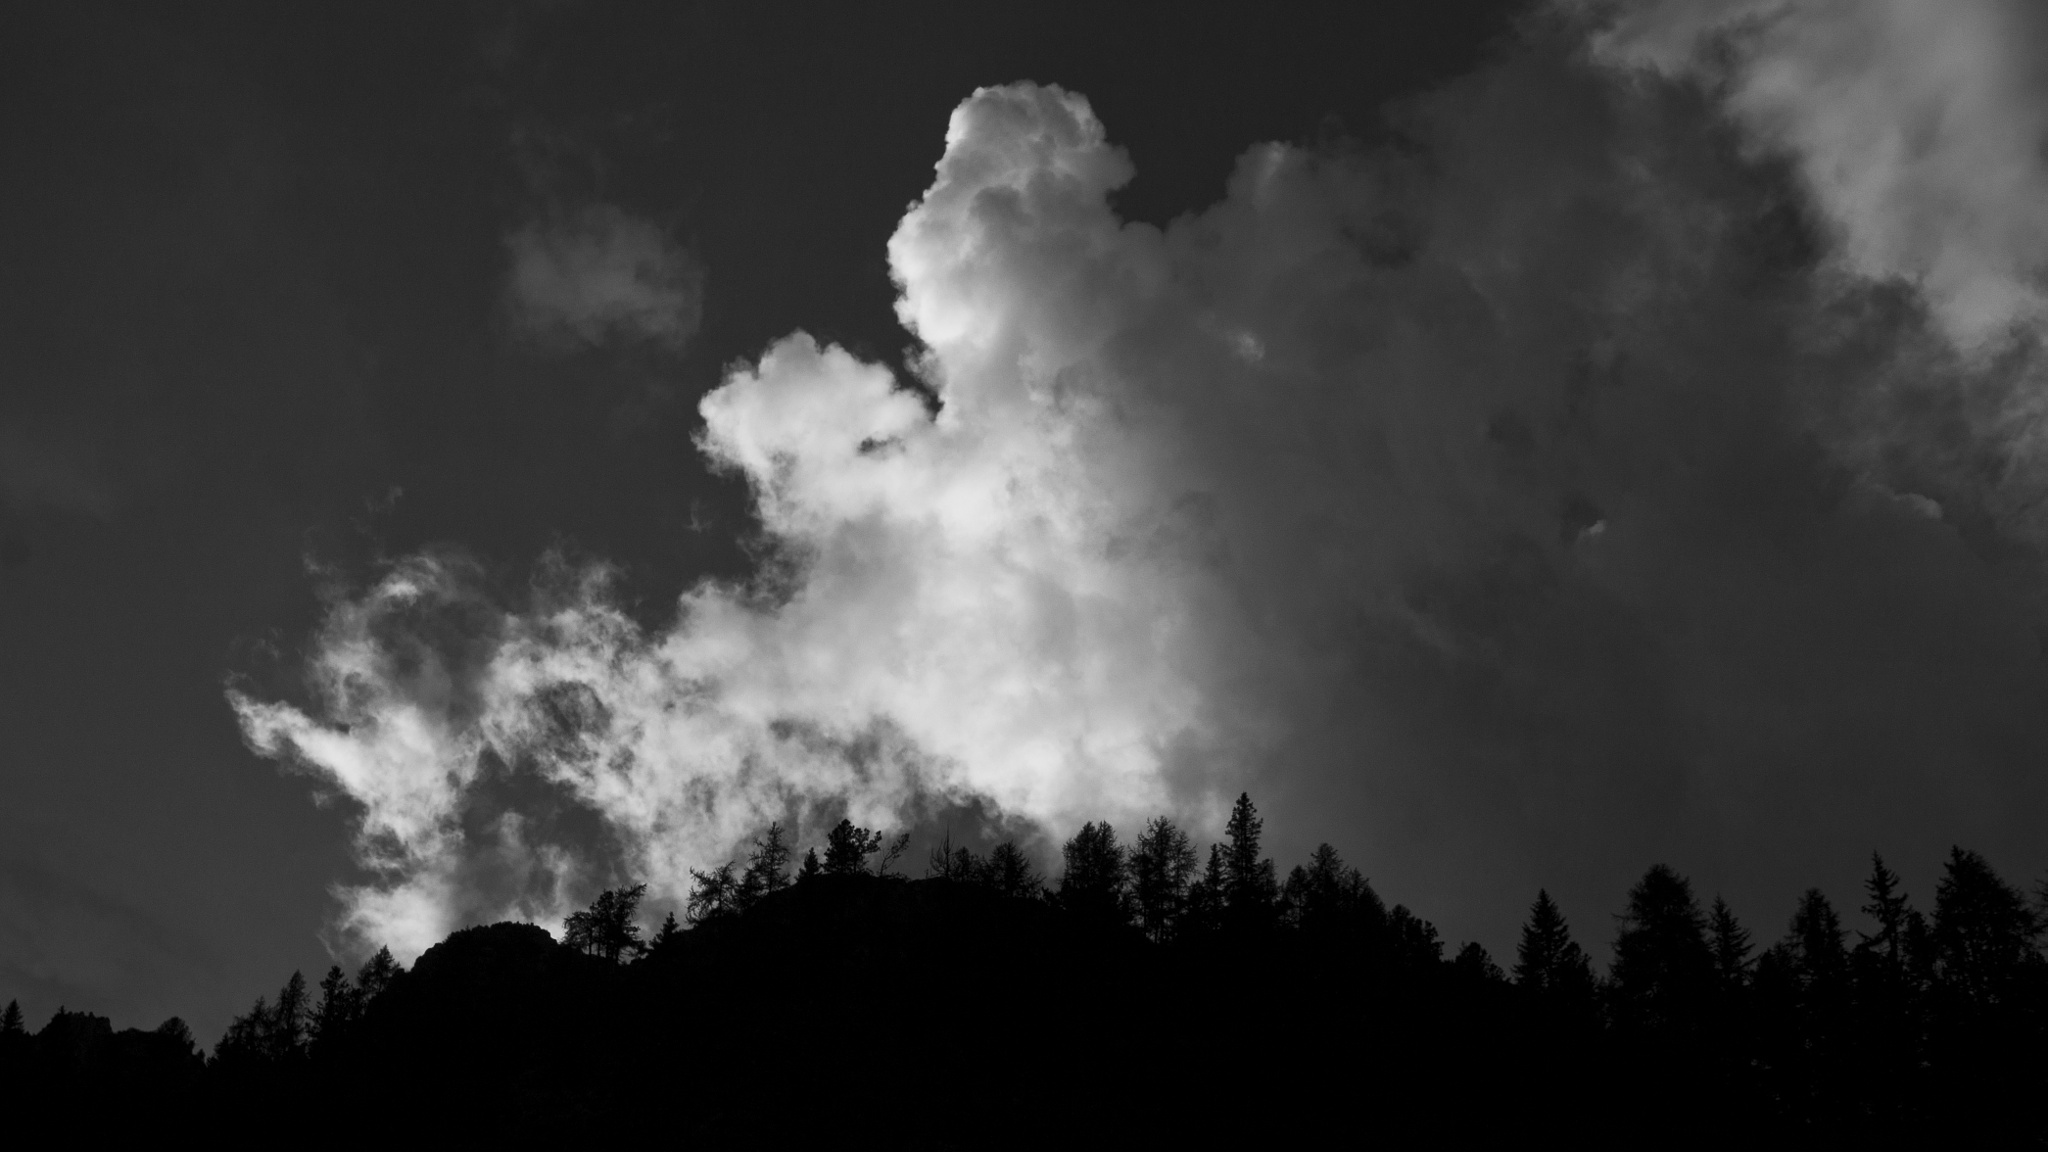 behind the mountains by Chiara Darù